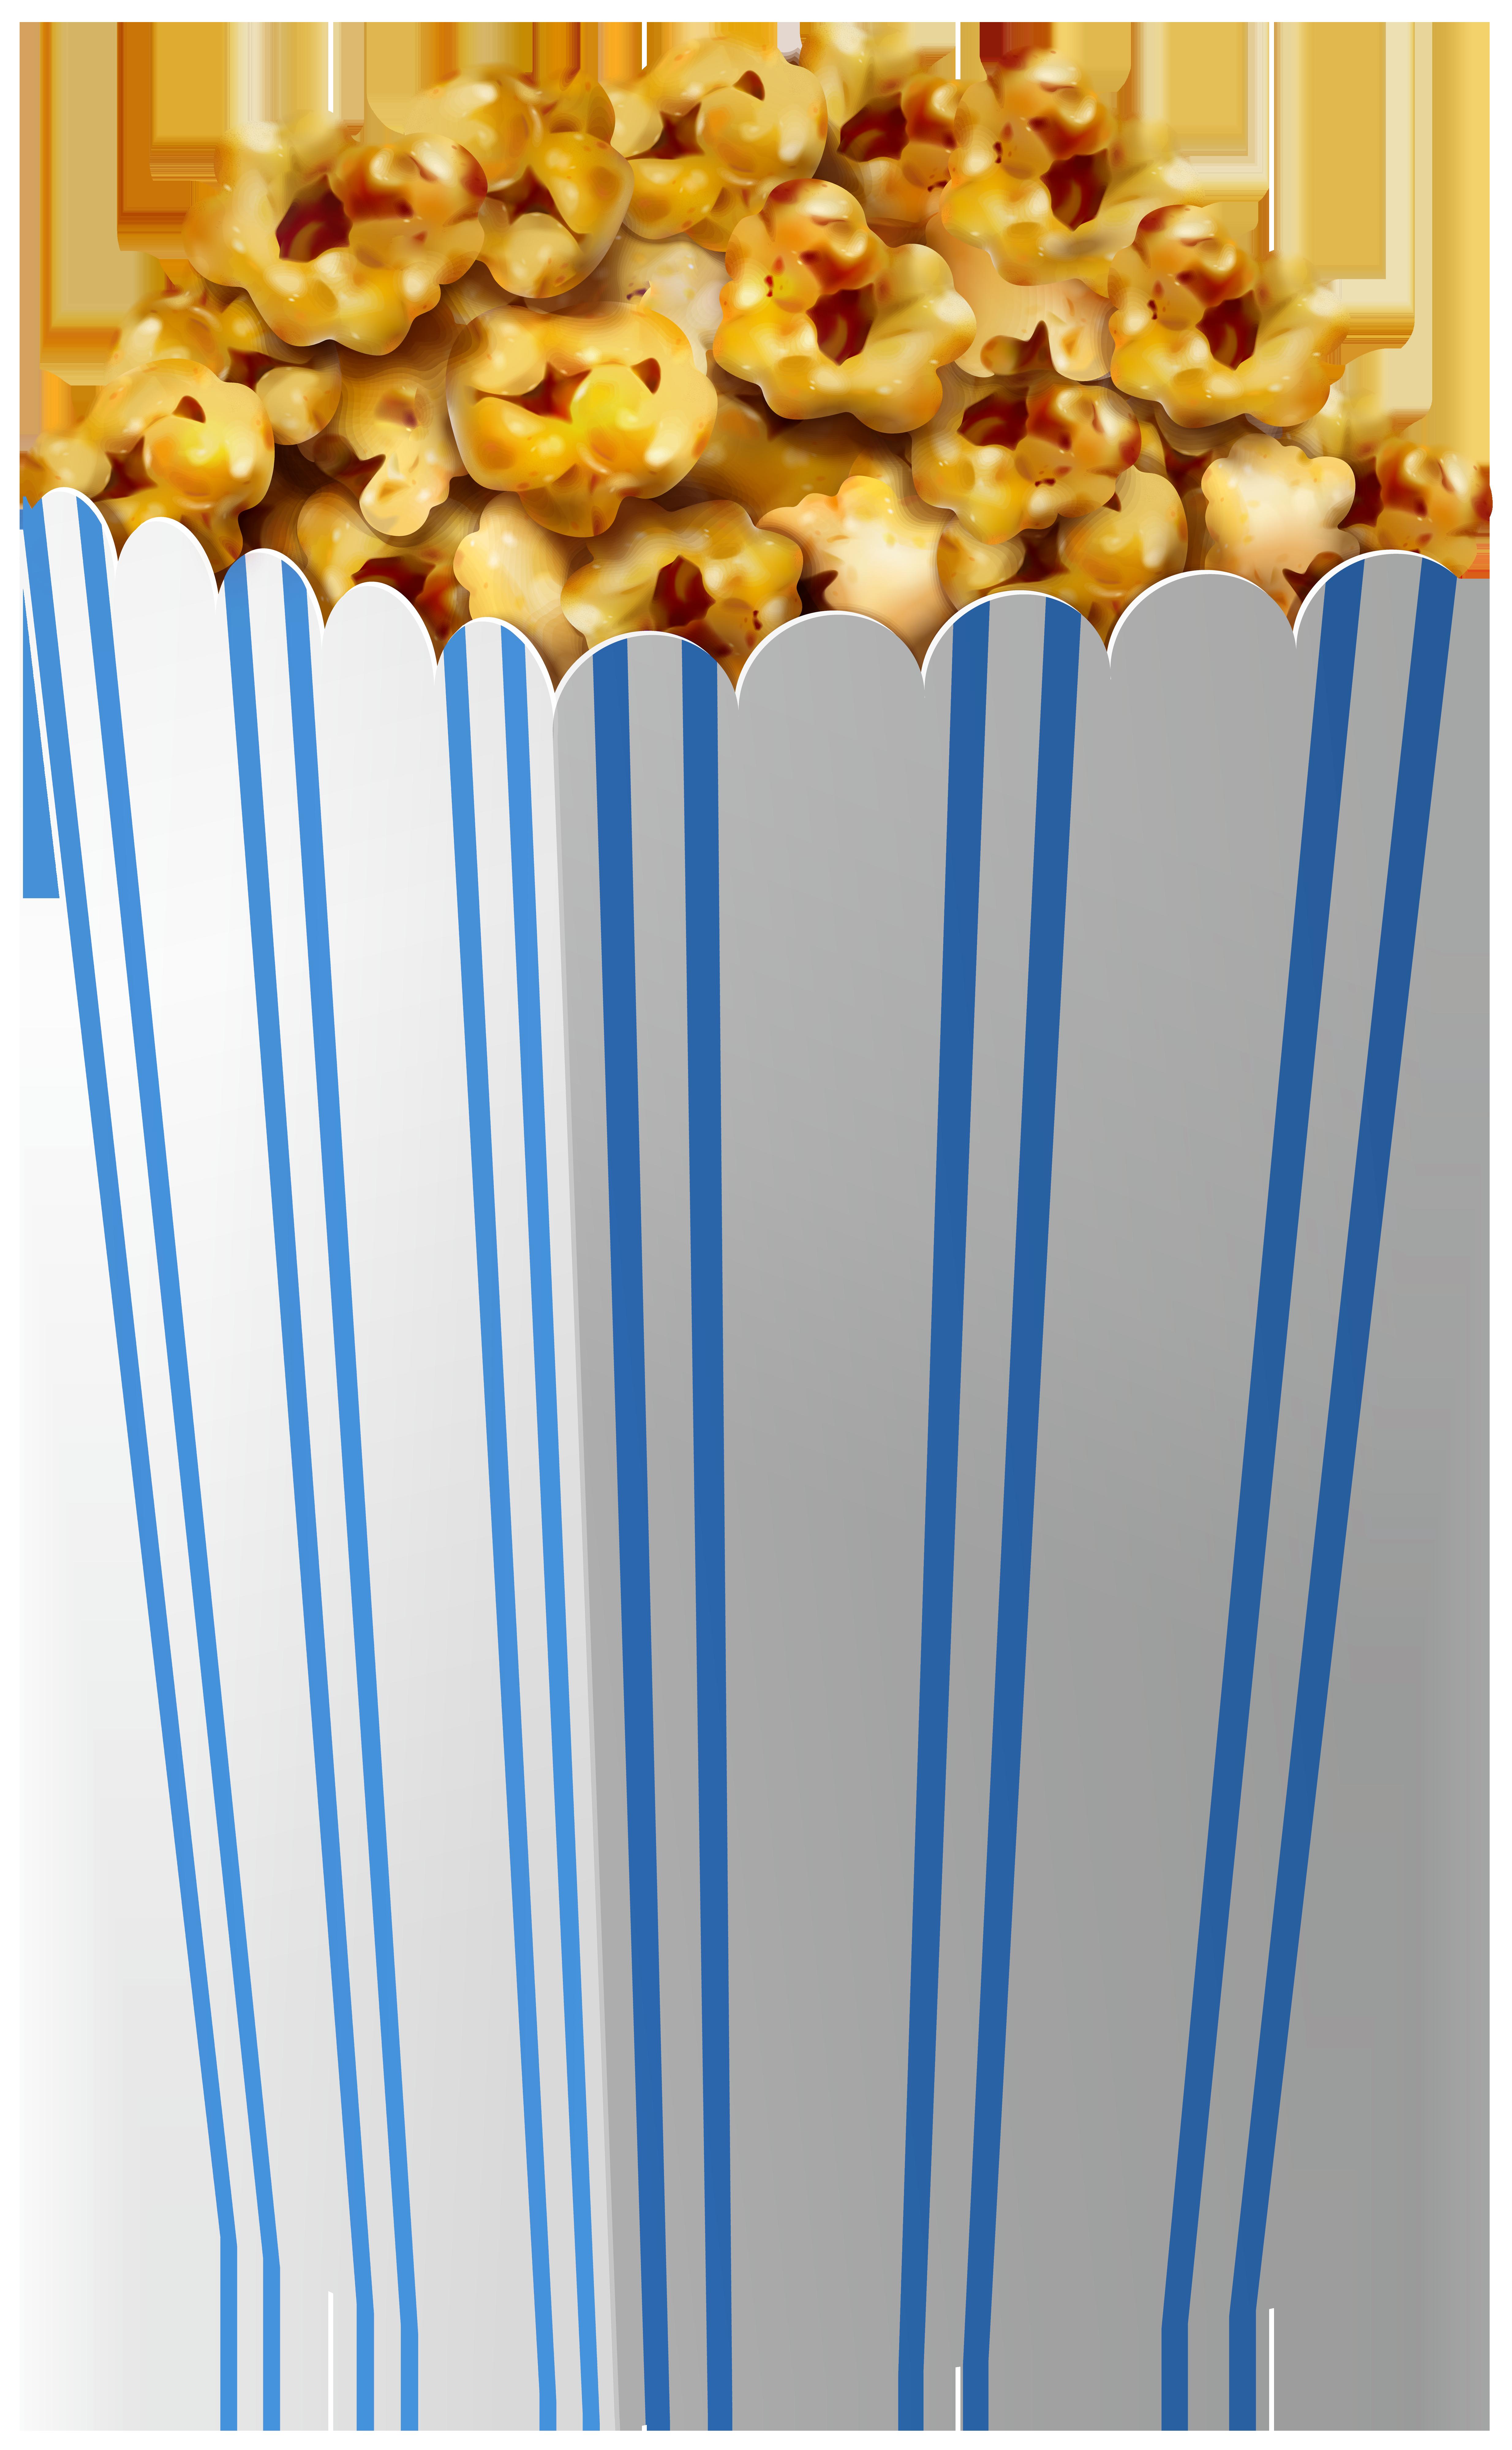 Caramel Popcorn Box PNG Clipart Image.